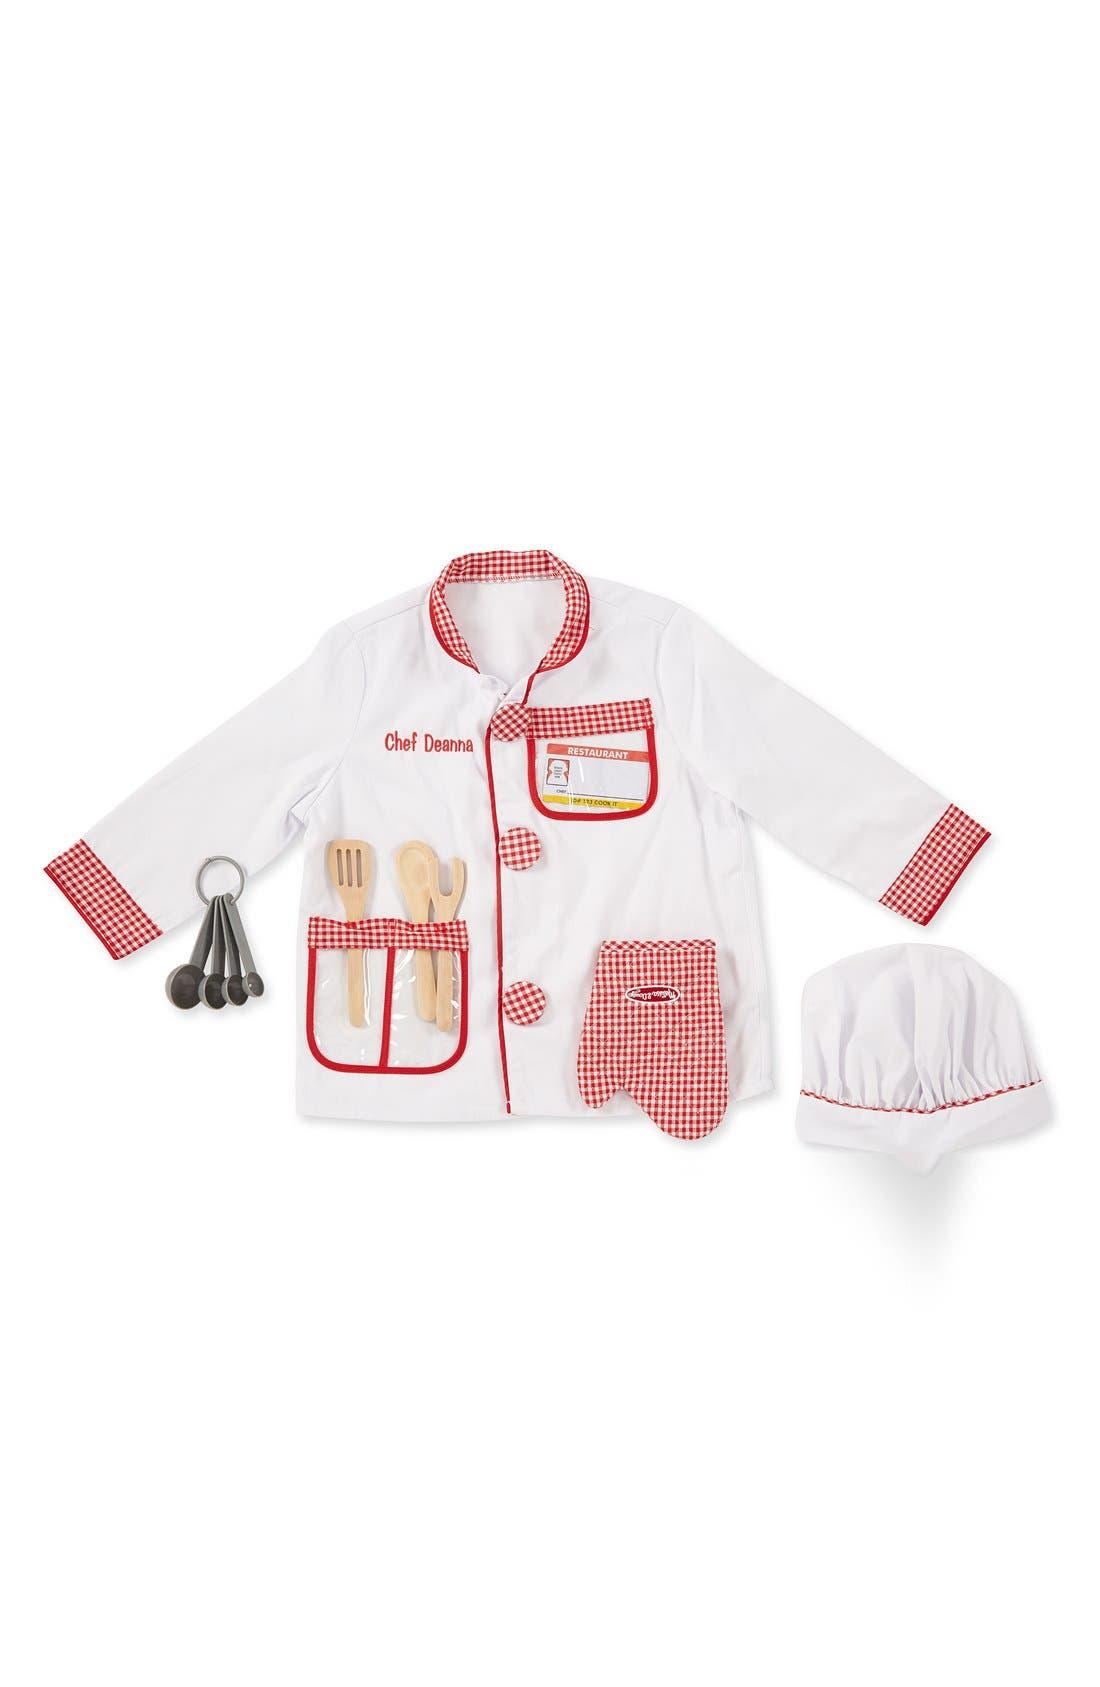 Main Image - Melissa & Doug 'Chef' Personalized Costume Set (Little Kid)